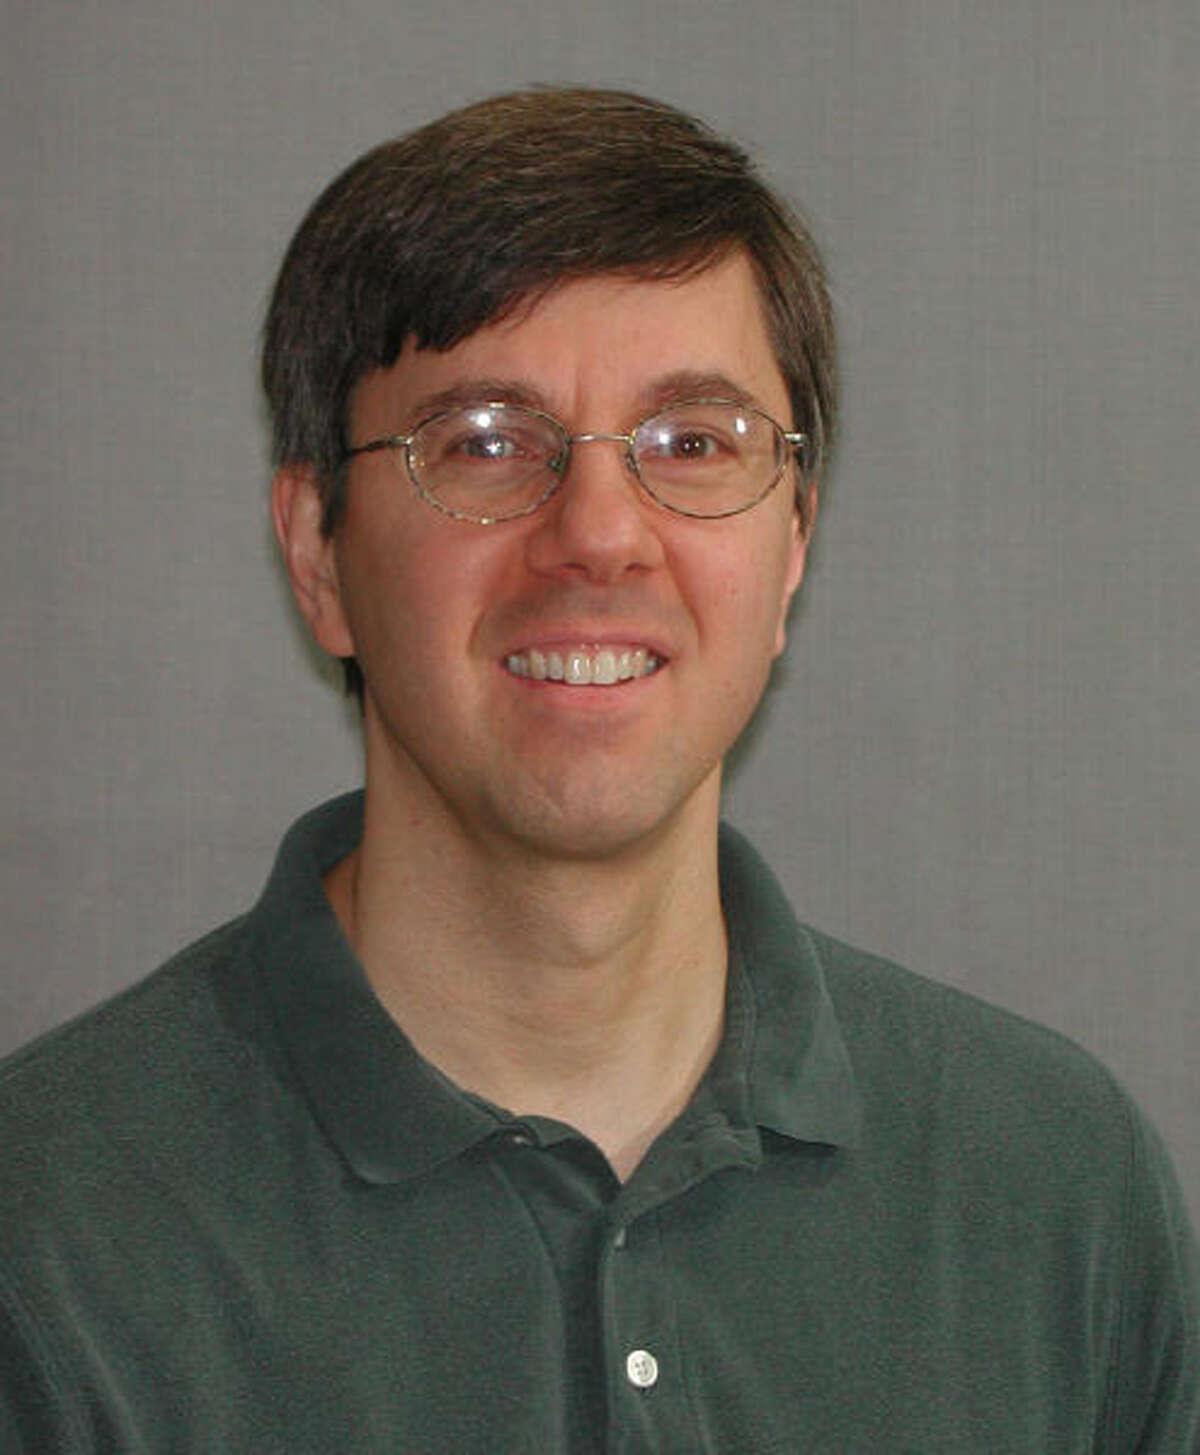 Cyril Morong, Ph.D., is associate professor of economics at San Antonio College.